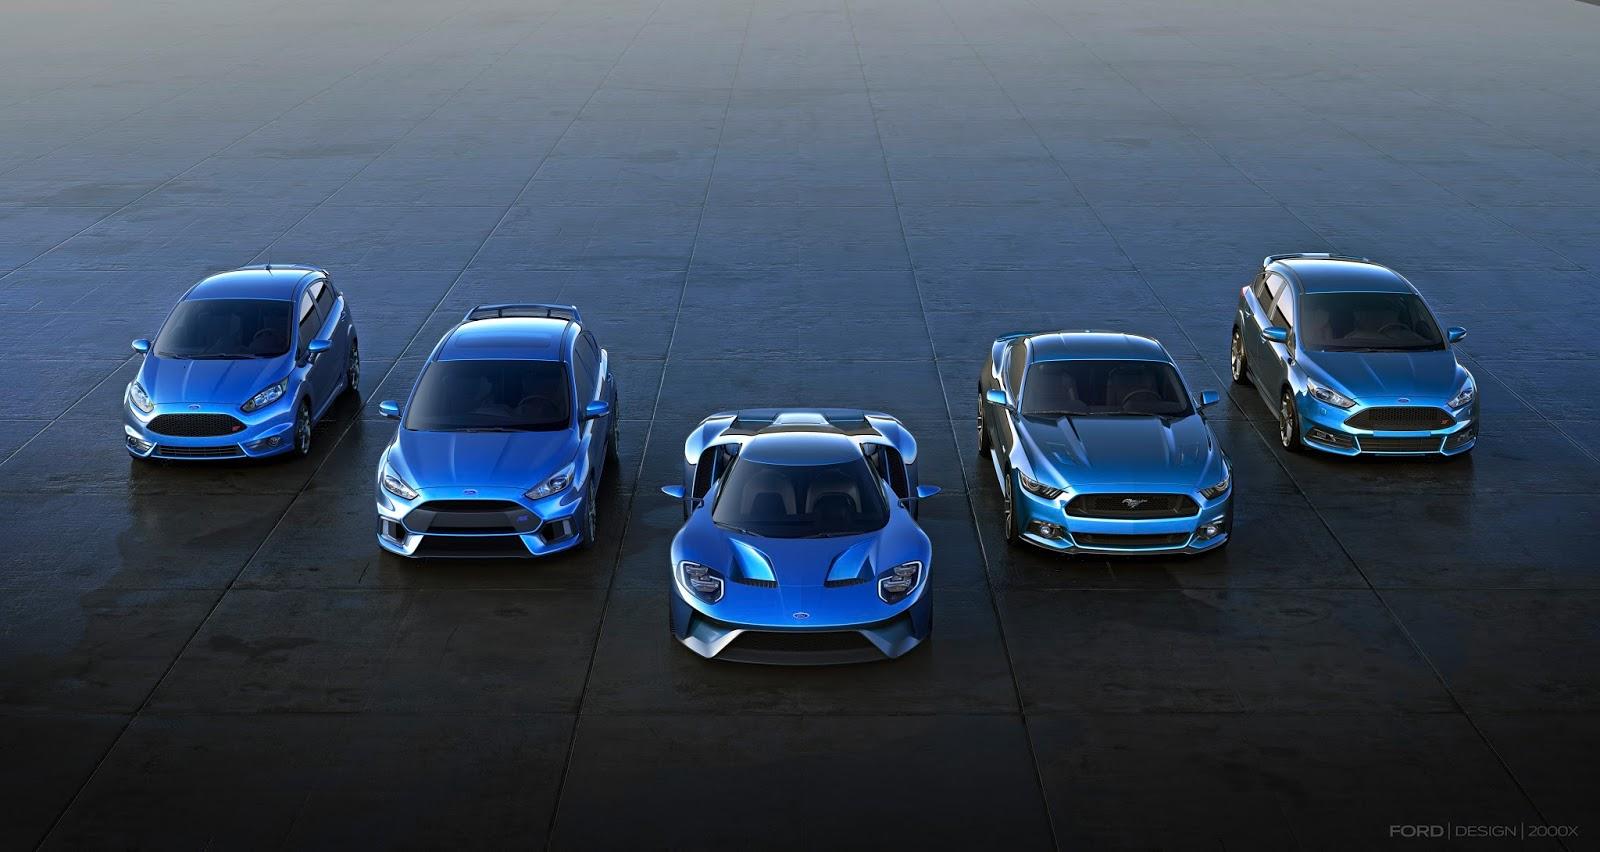 FocusRS Production 01 Το πρώτο Focus RS βγήκε από τη γραμμή παραγωγής του Saarlouis στη Γερμανία, έρχεται και το Ford GT